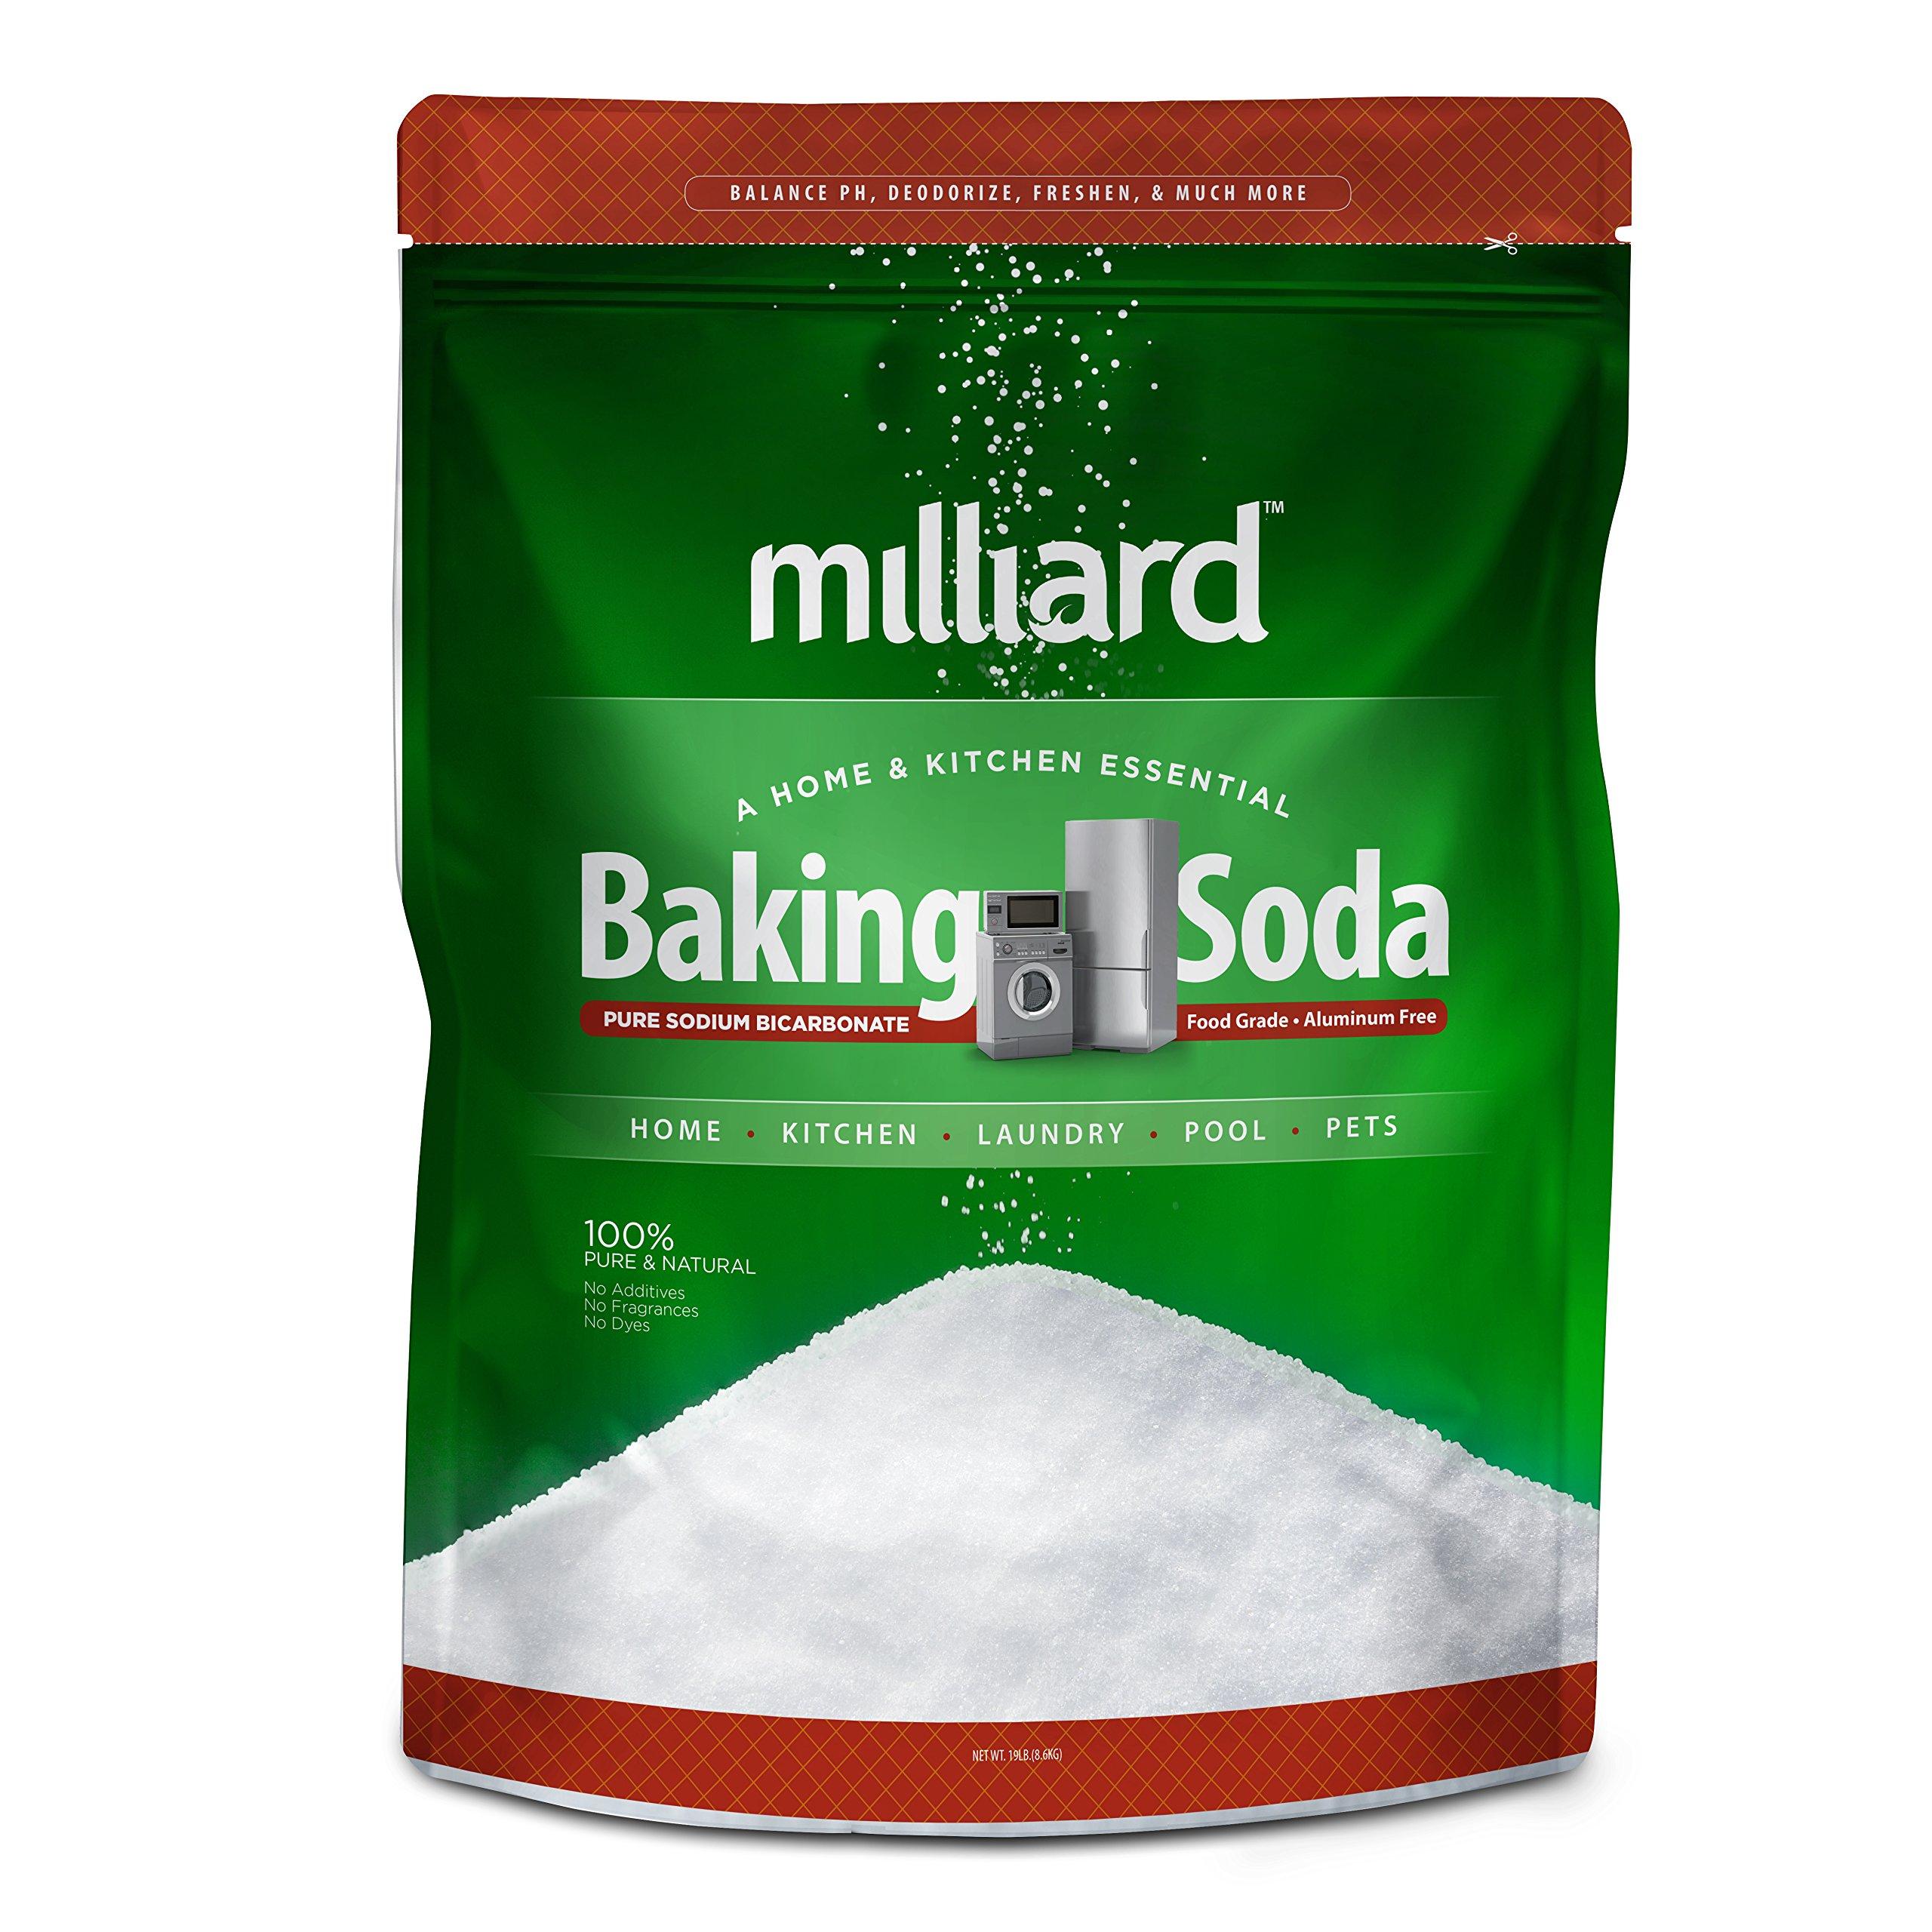 Milliard 19lbs Baking Soda / Sodium Bicarbonate USP - 19 Pound Bulk Resealable Bag